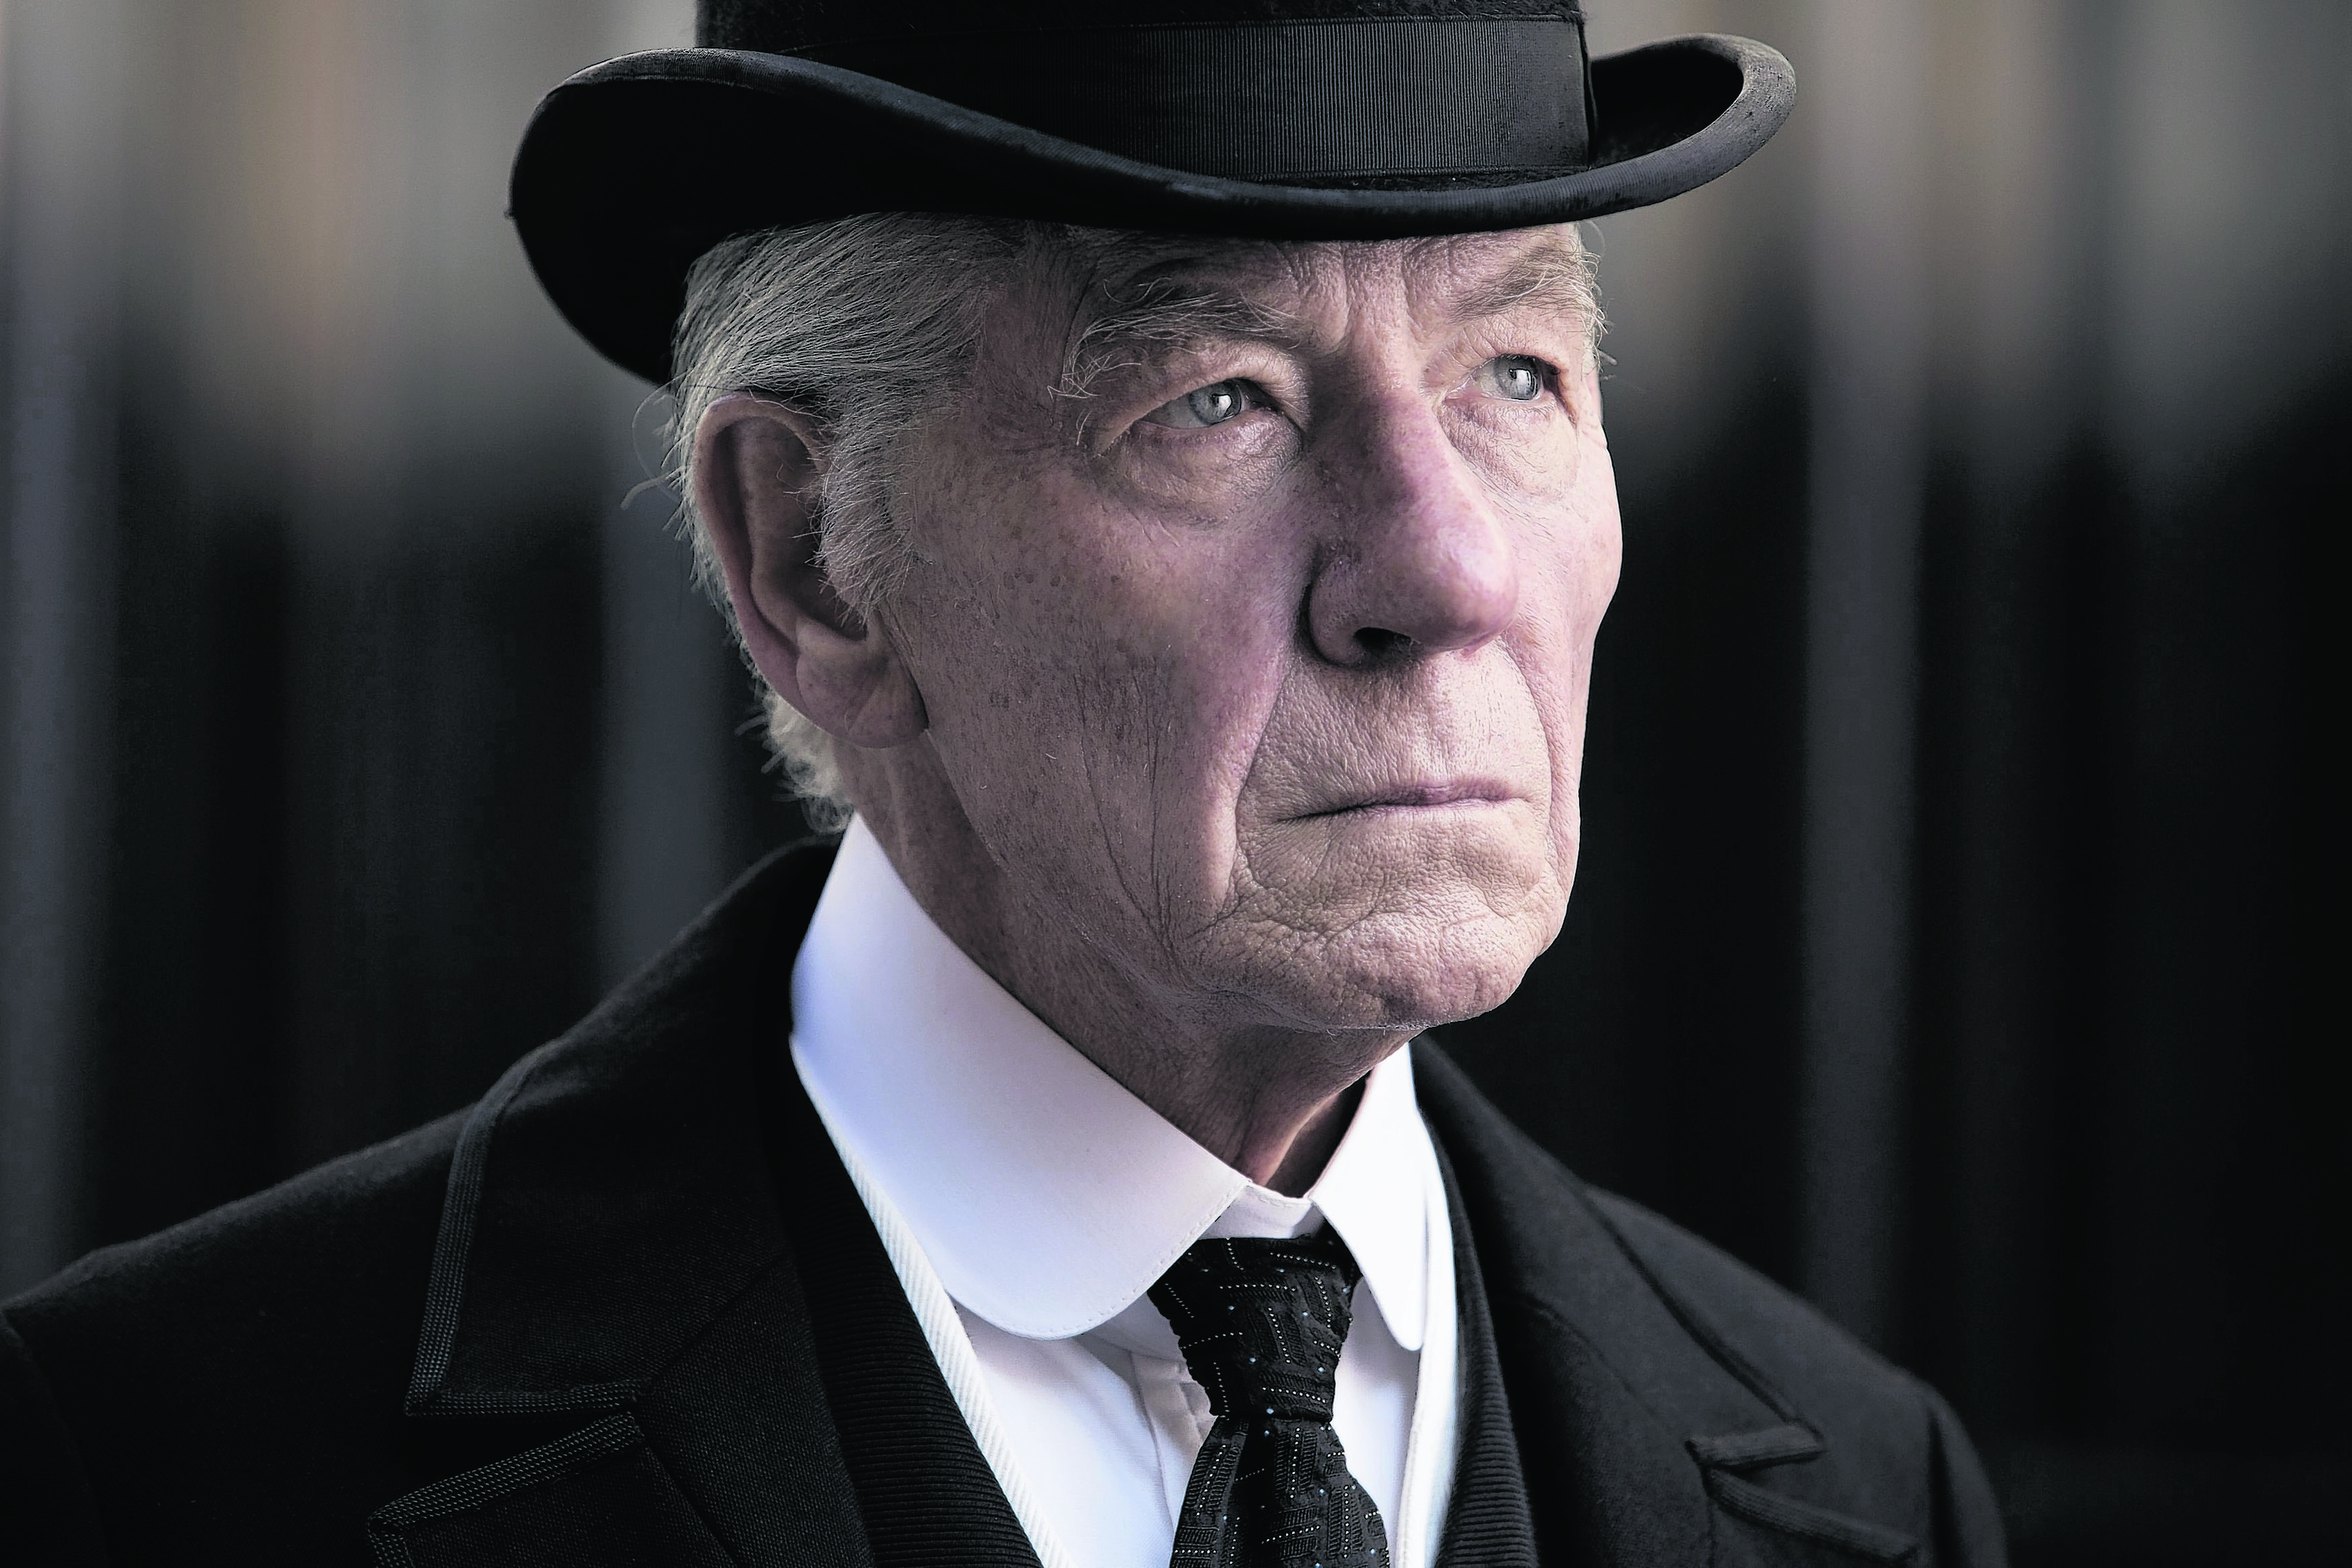 Sir Ian McKellen as Sherlock Holmes